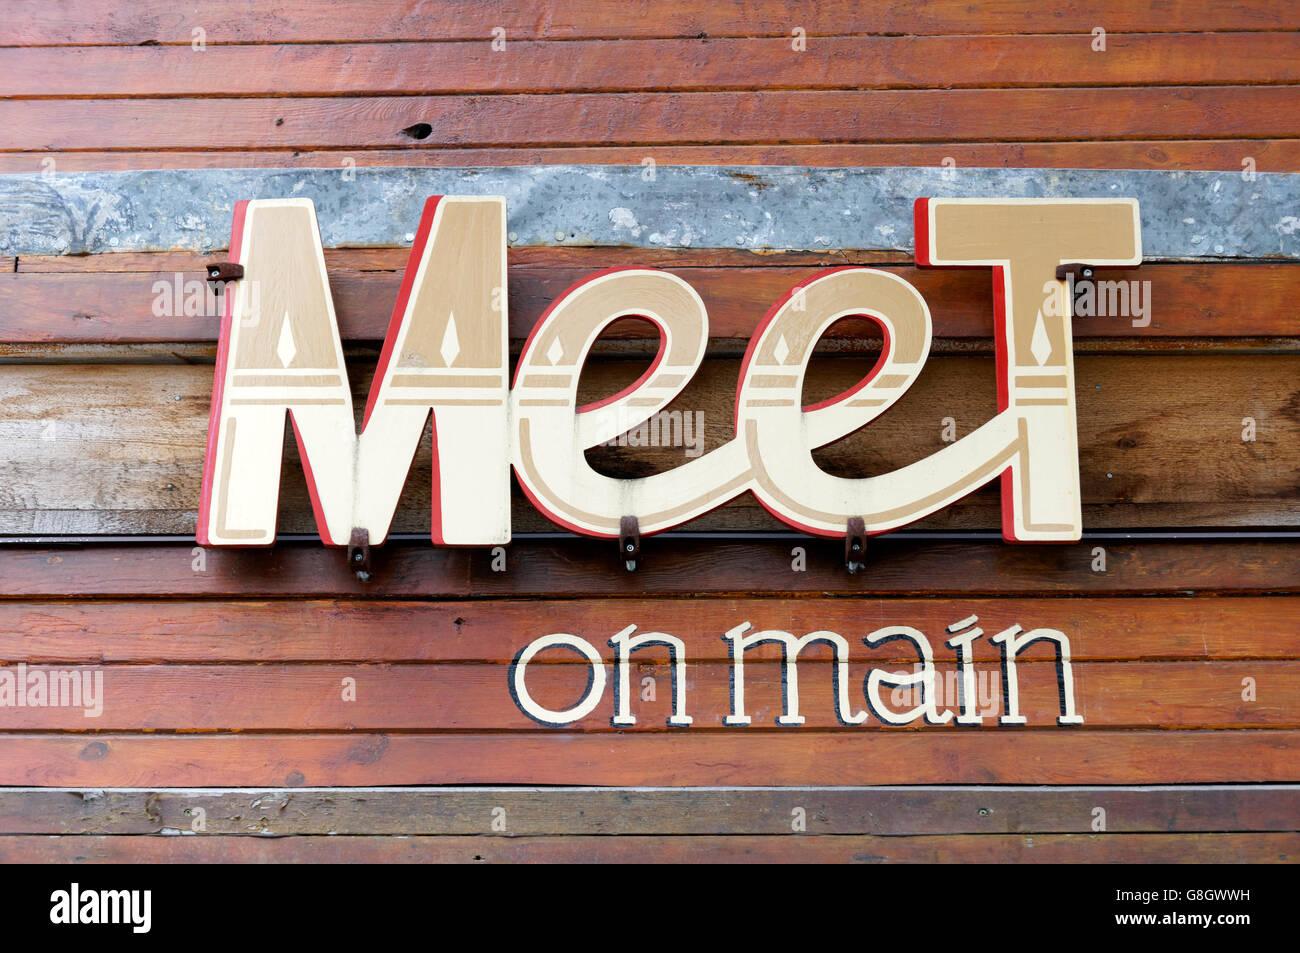 Meet on Main vegan restaurant on Main Street, Vancouver, British Columbia, Canada - Stock Image